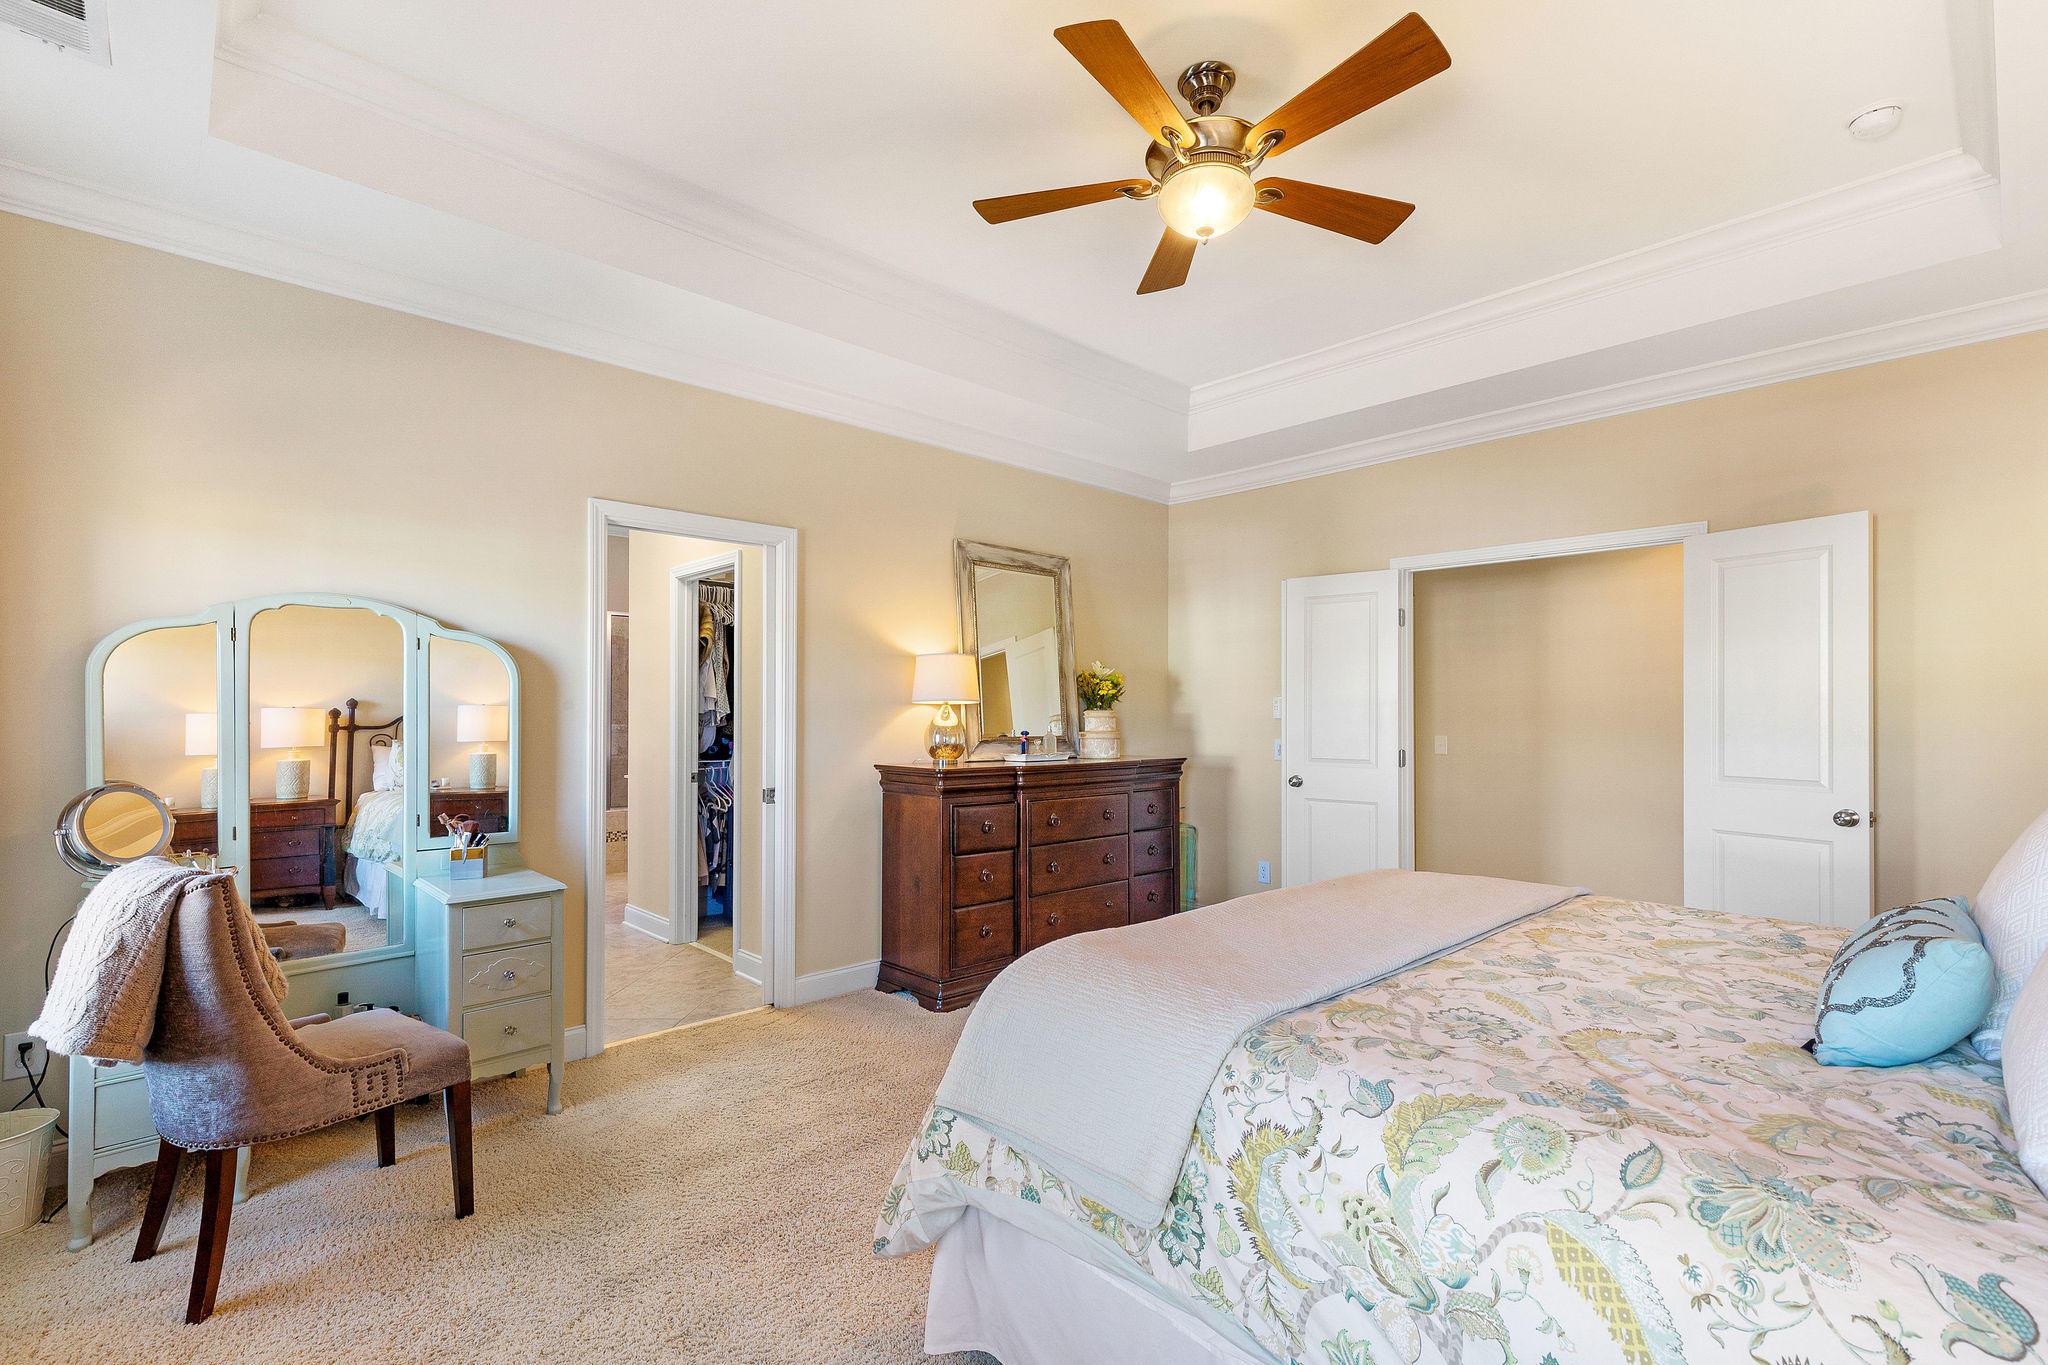 Dunes West Homes For Sale - 3212 Hatchway, Mount Pleasant, SC - 1